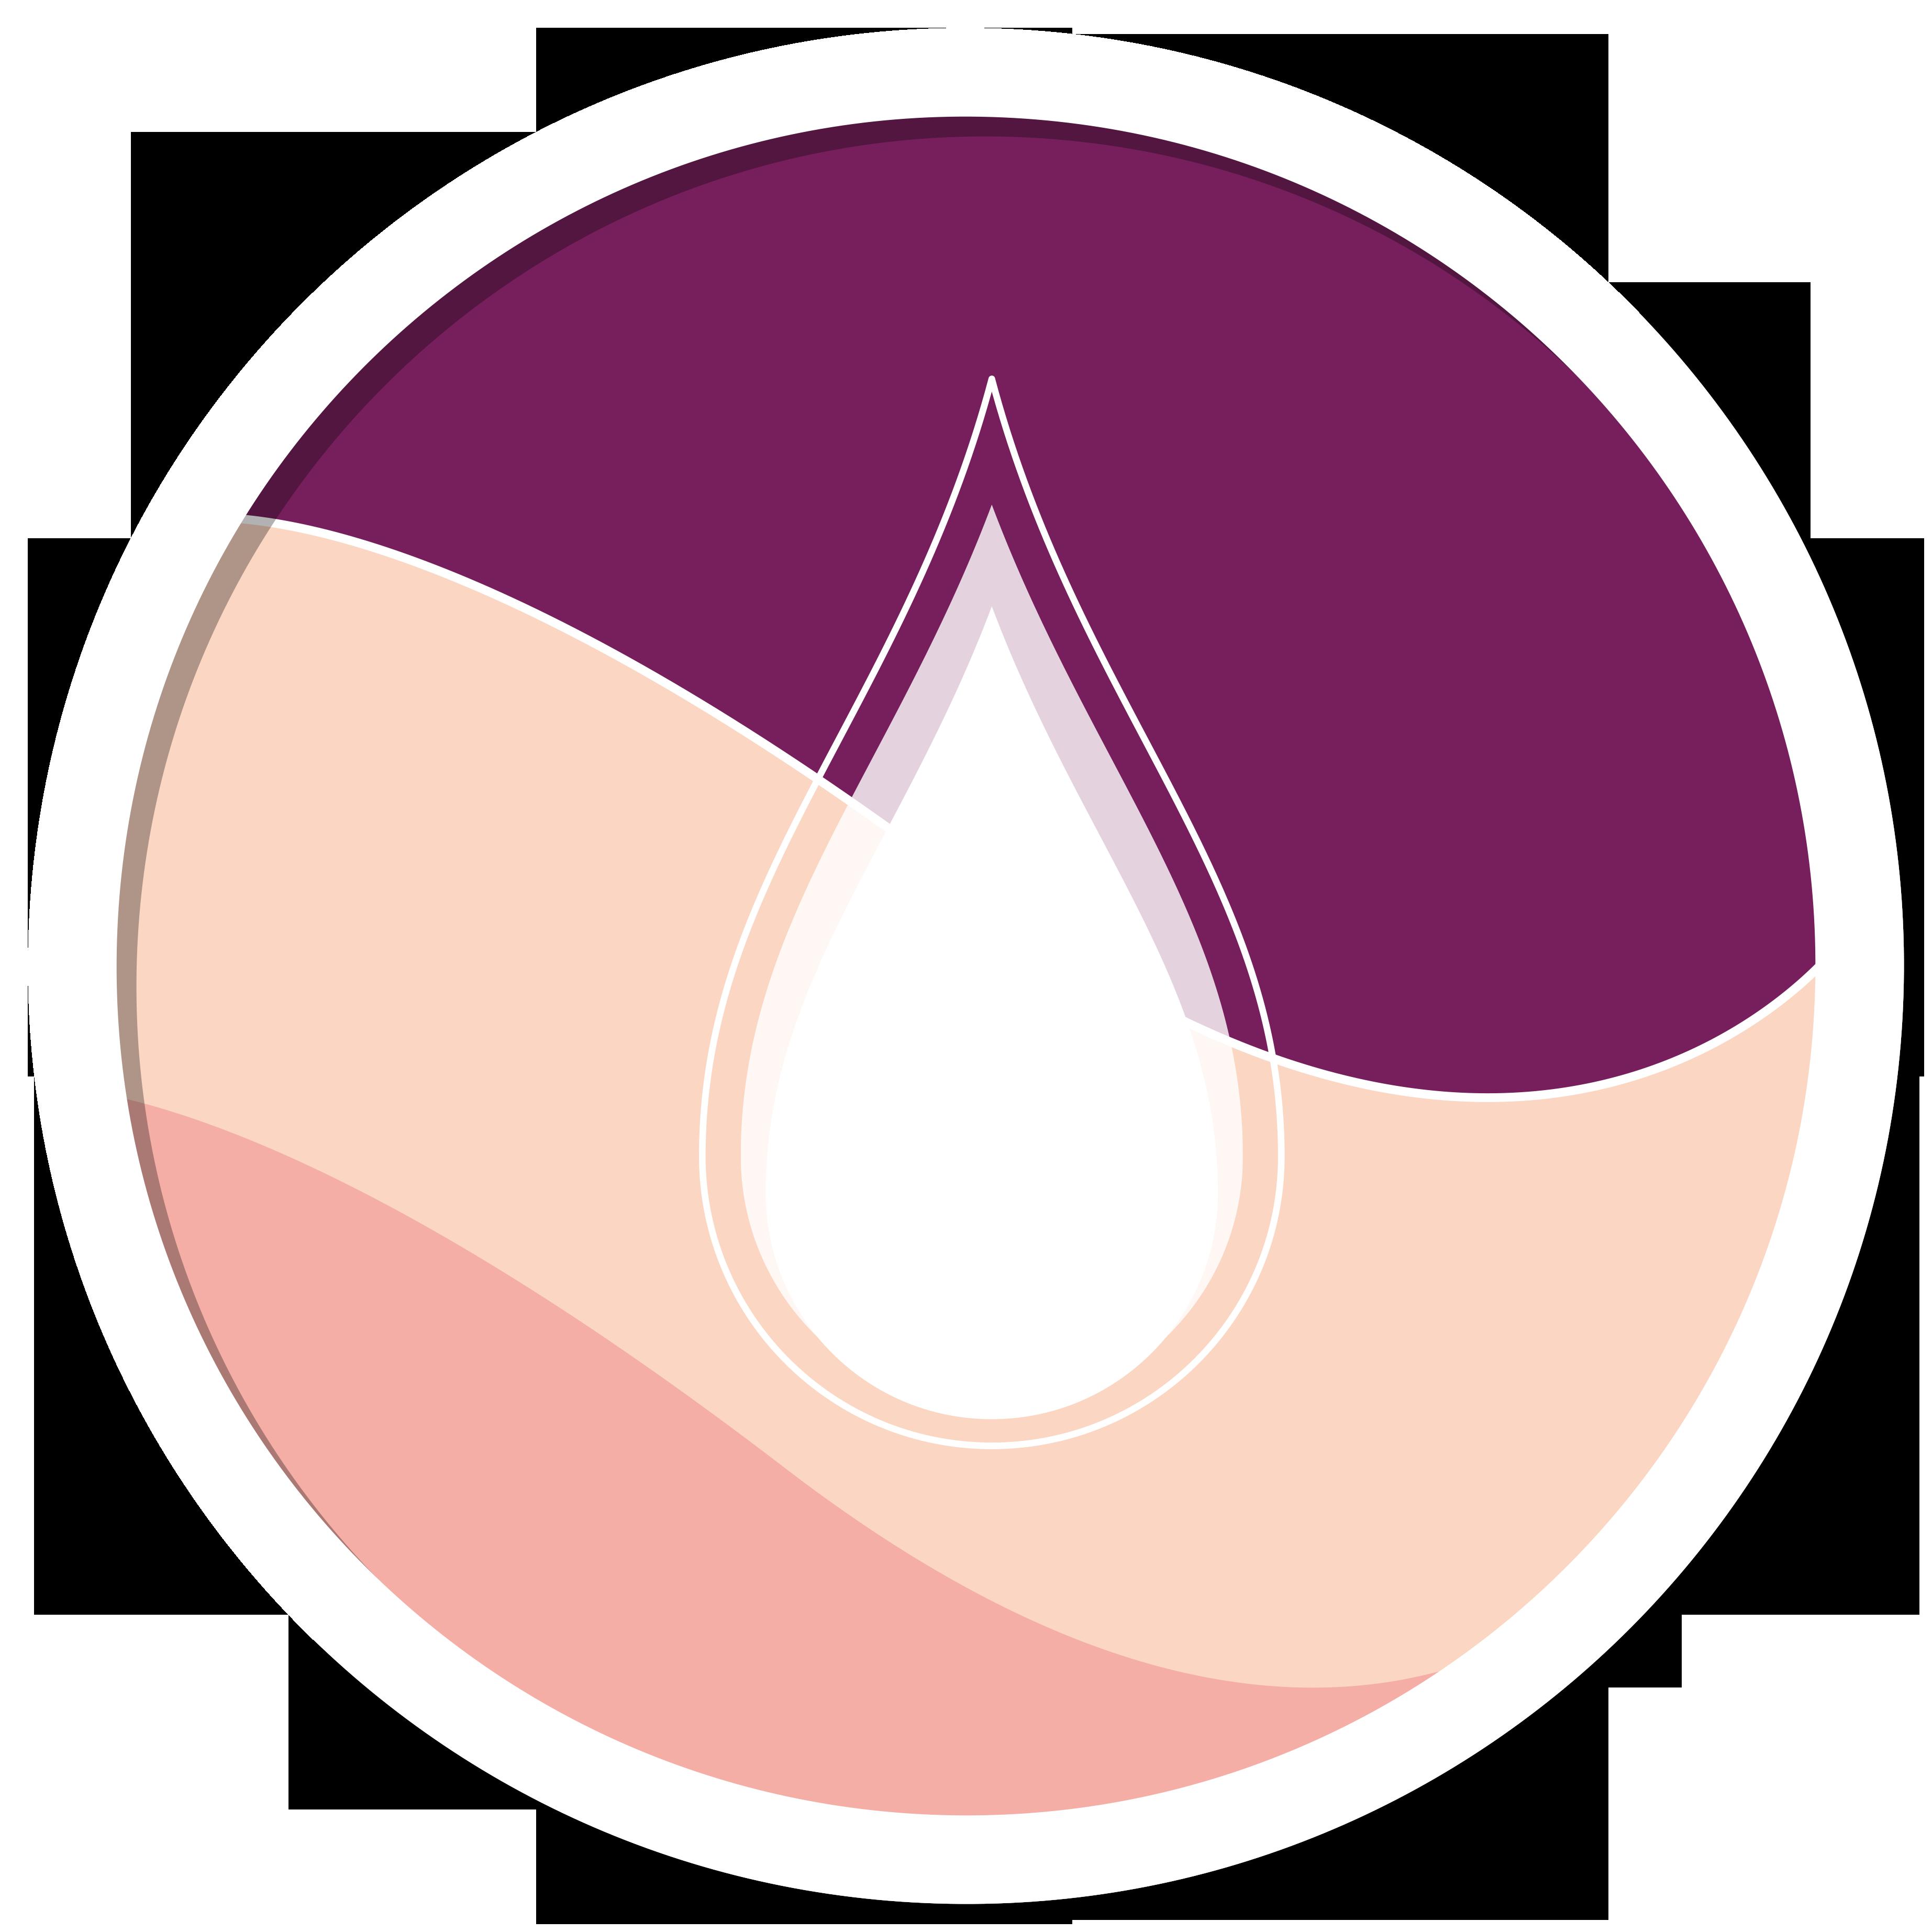 Skin clipart skin problem. Dry eczema arkadiance solvers